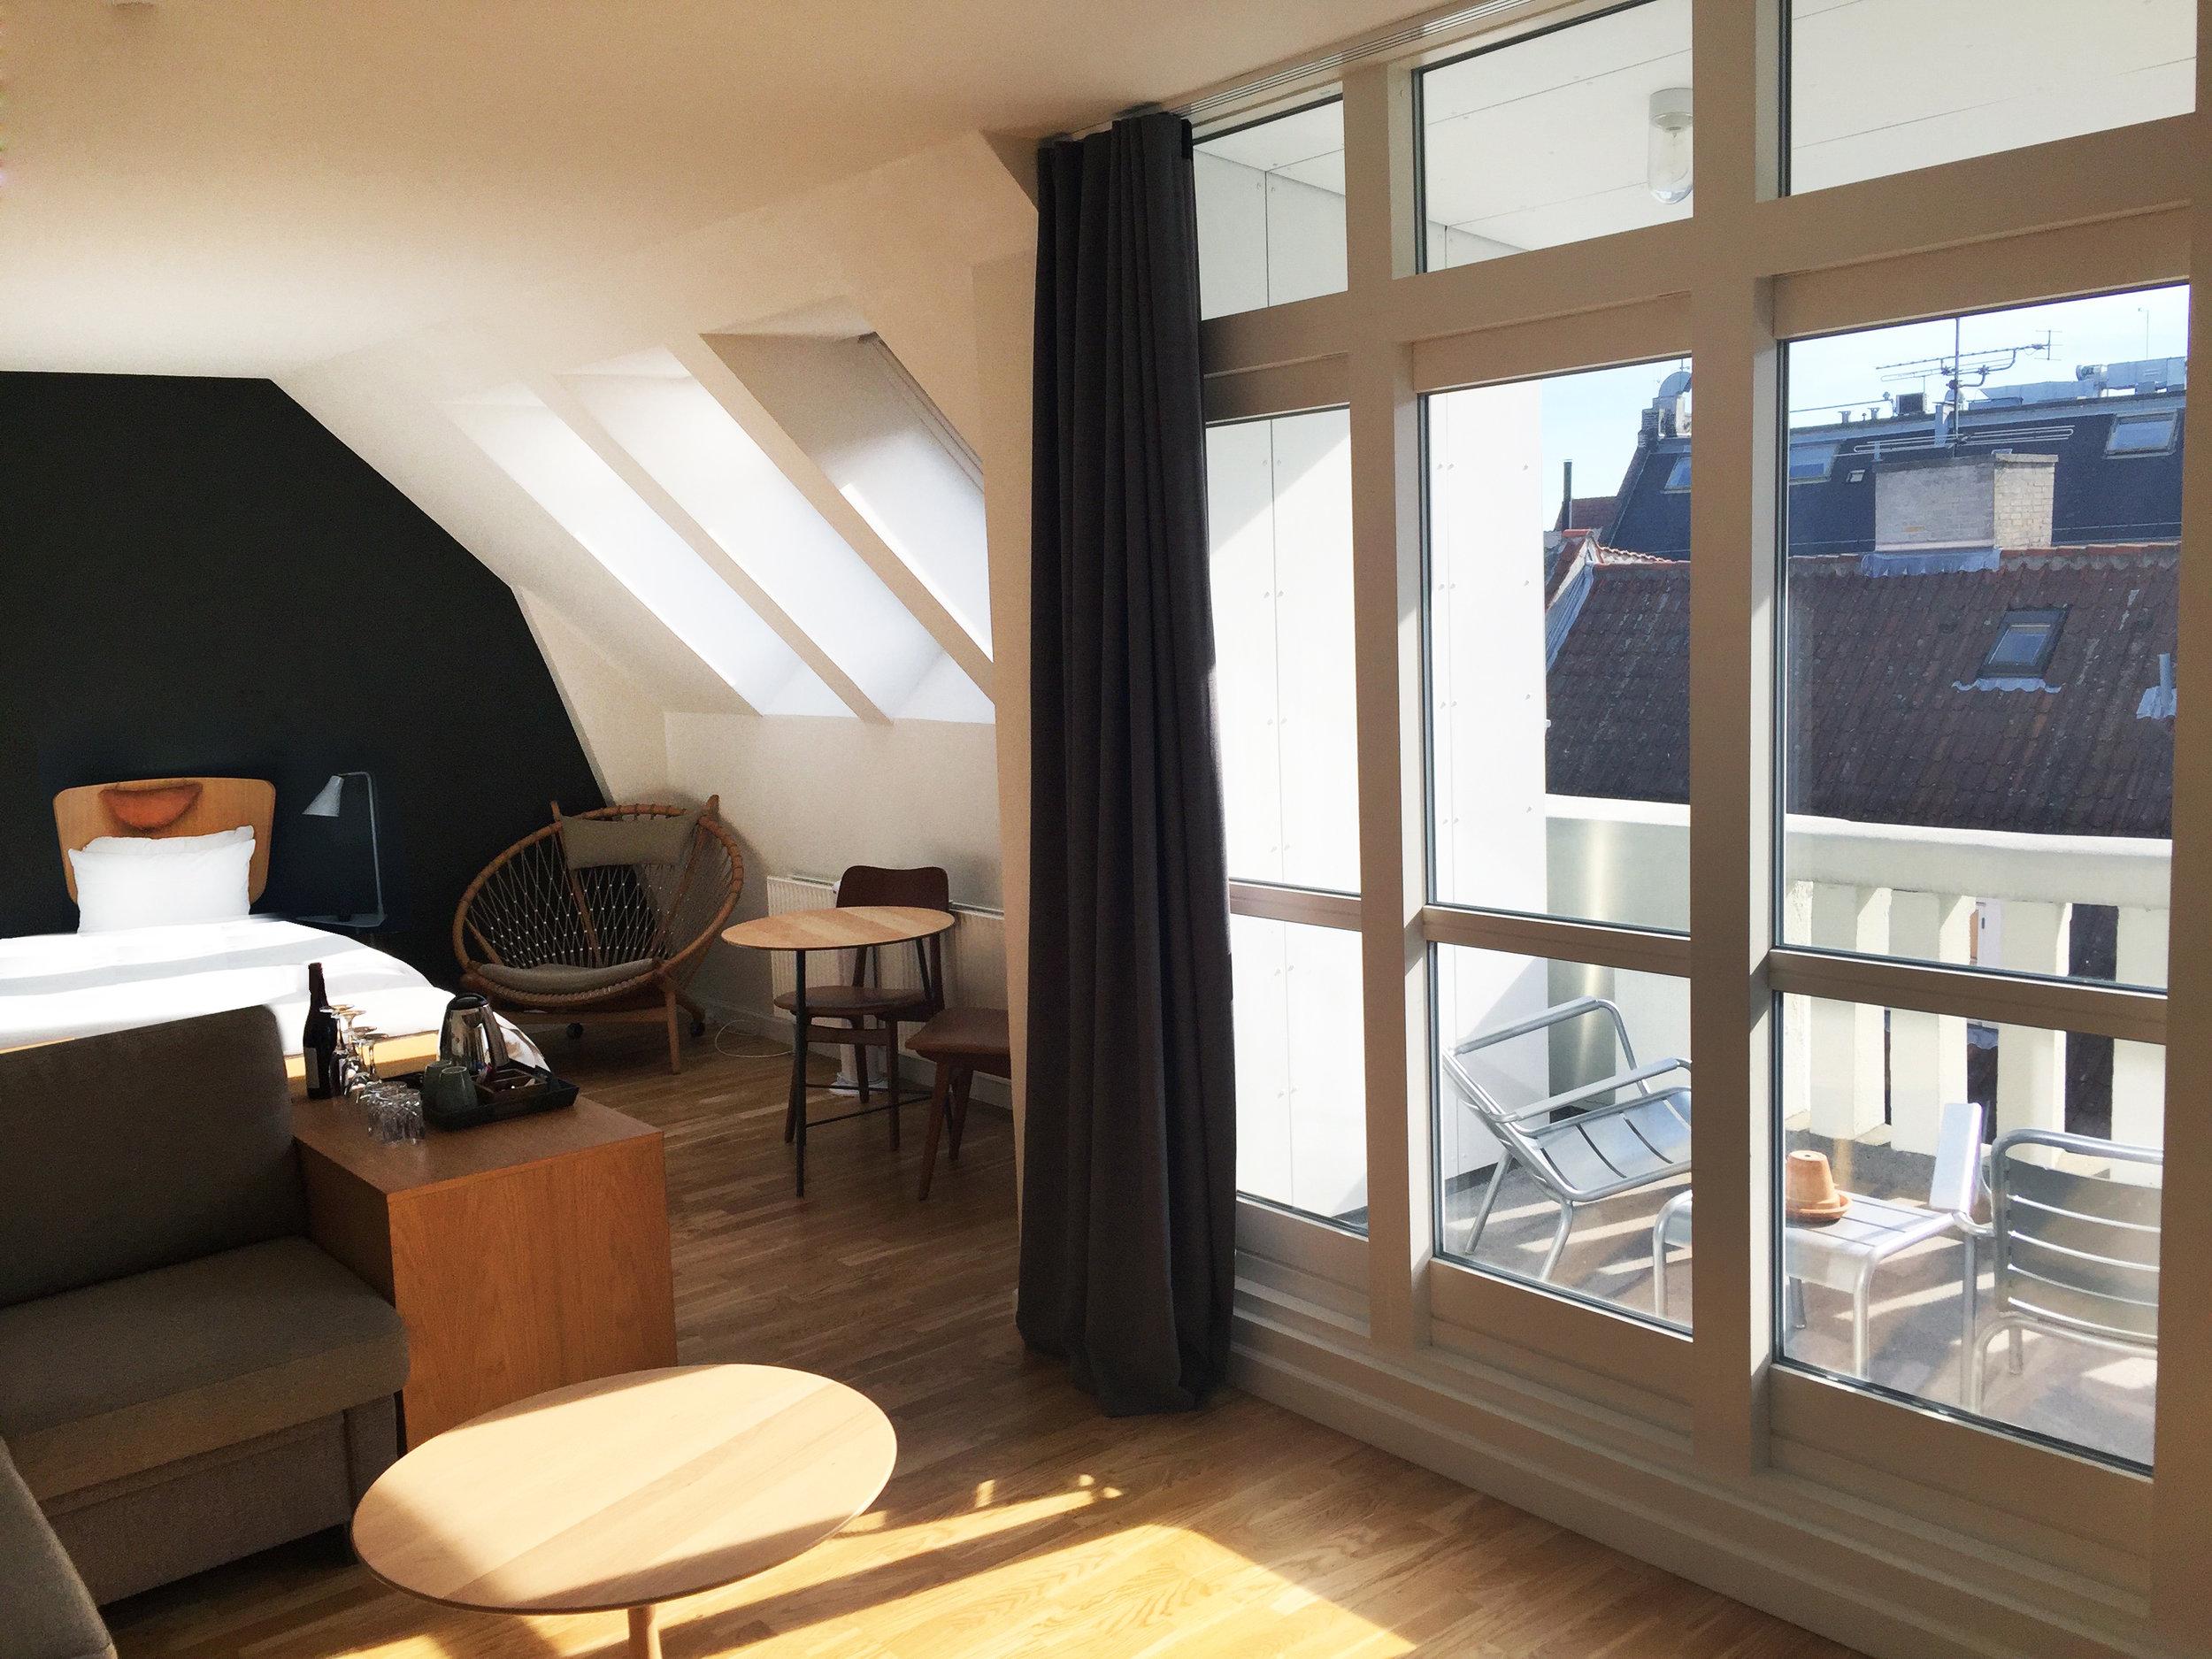 HotelSP34_Penthouse_Suite-2.jpg